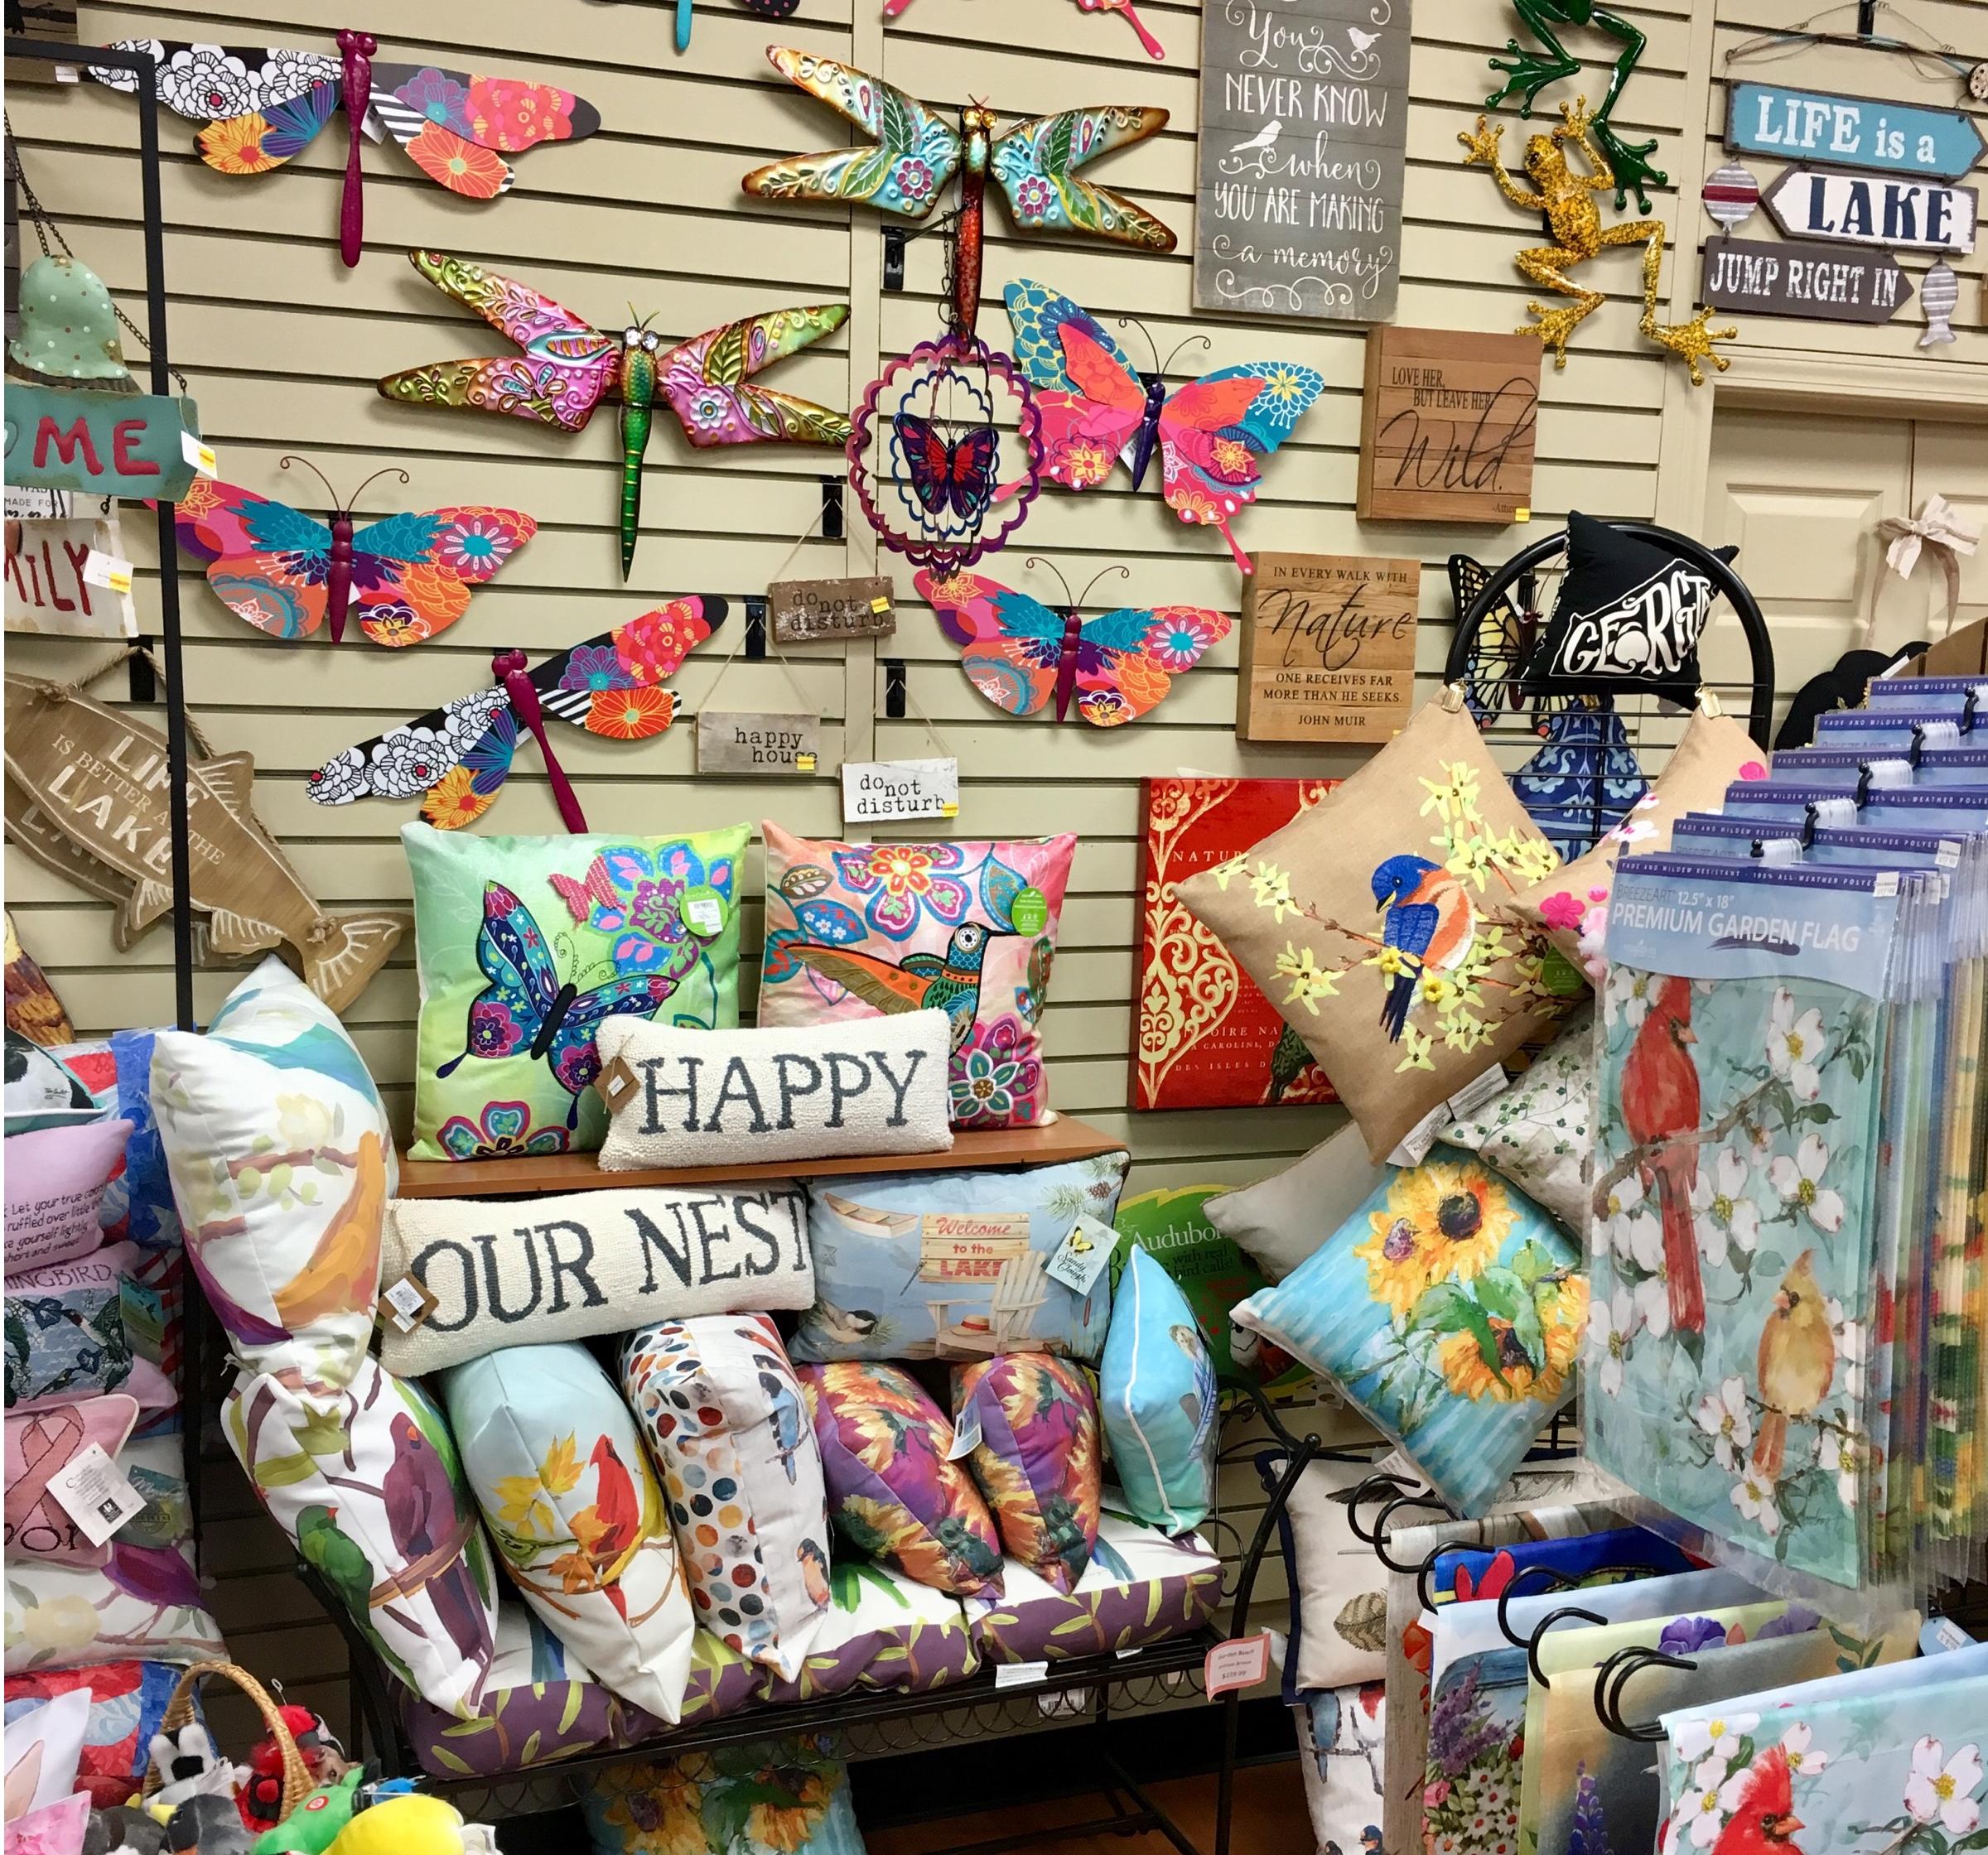 spring, decor, pillows, wall art, butterfly, dragonfly